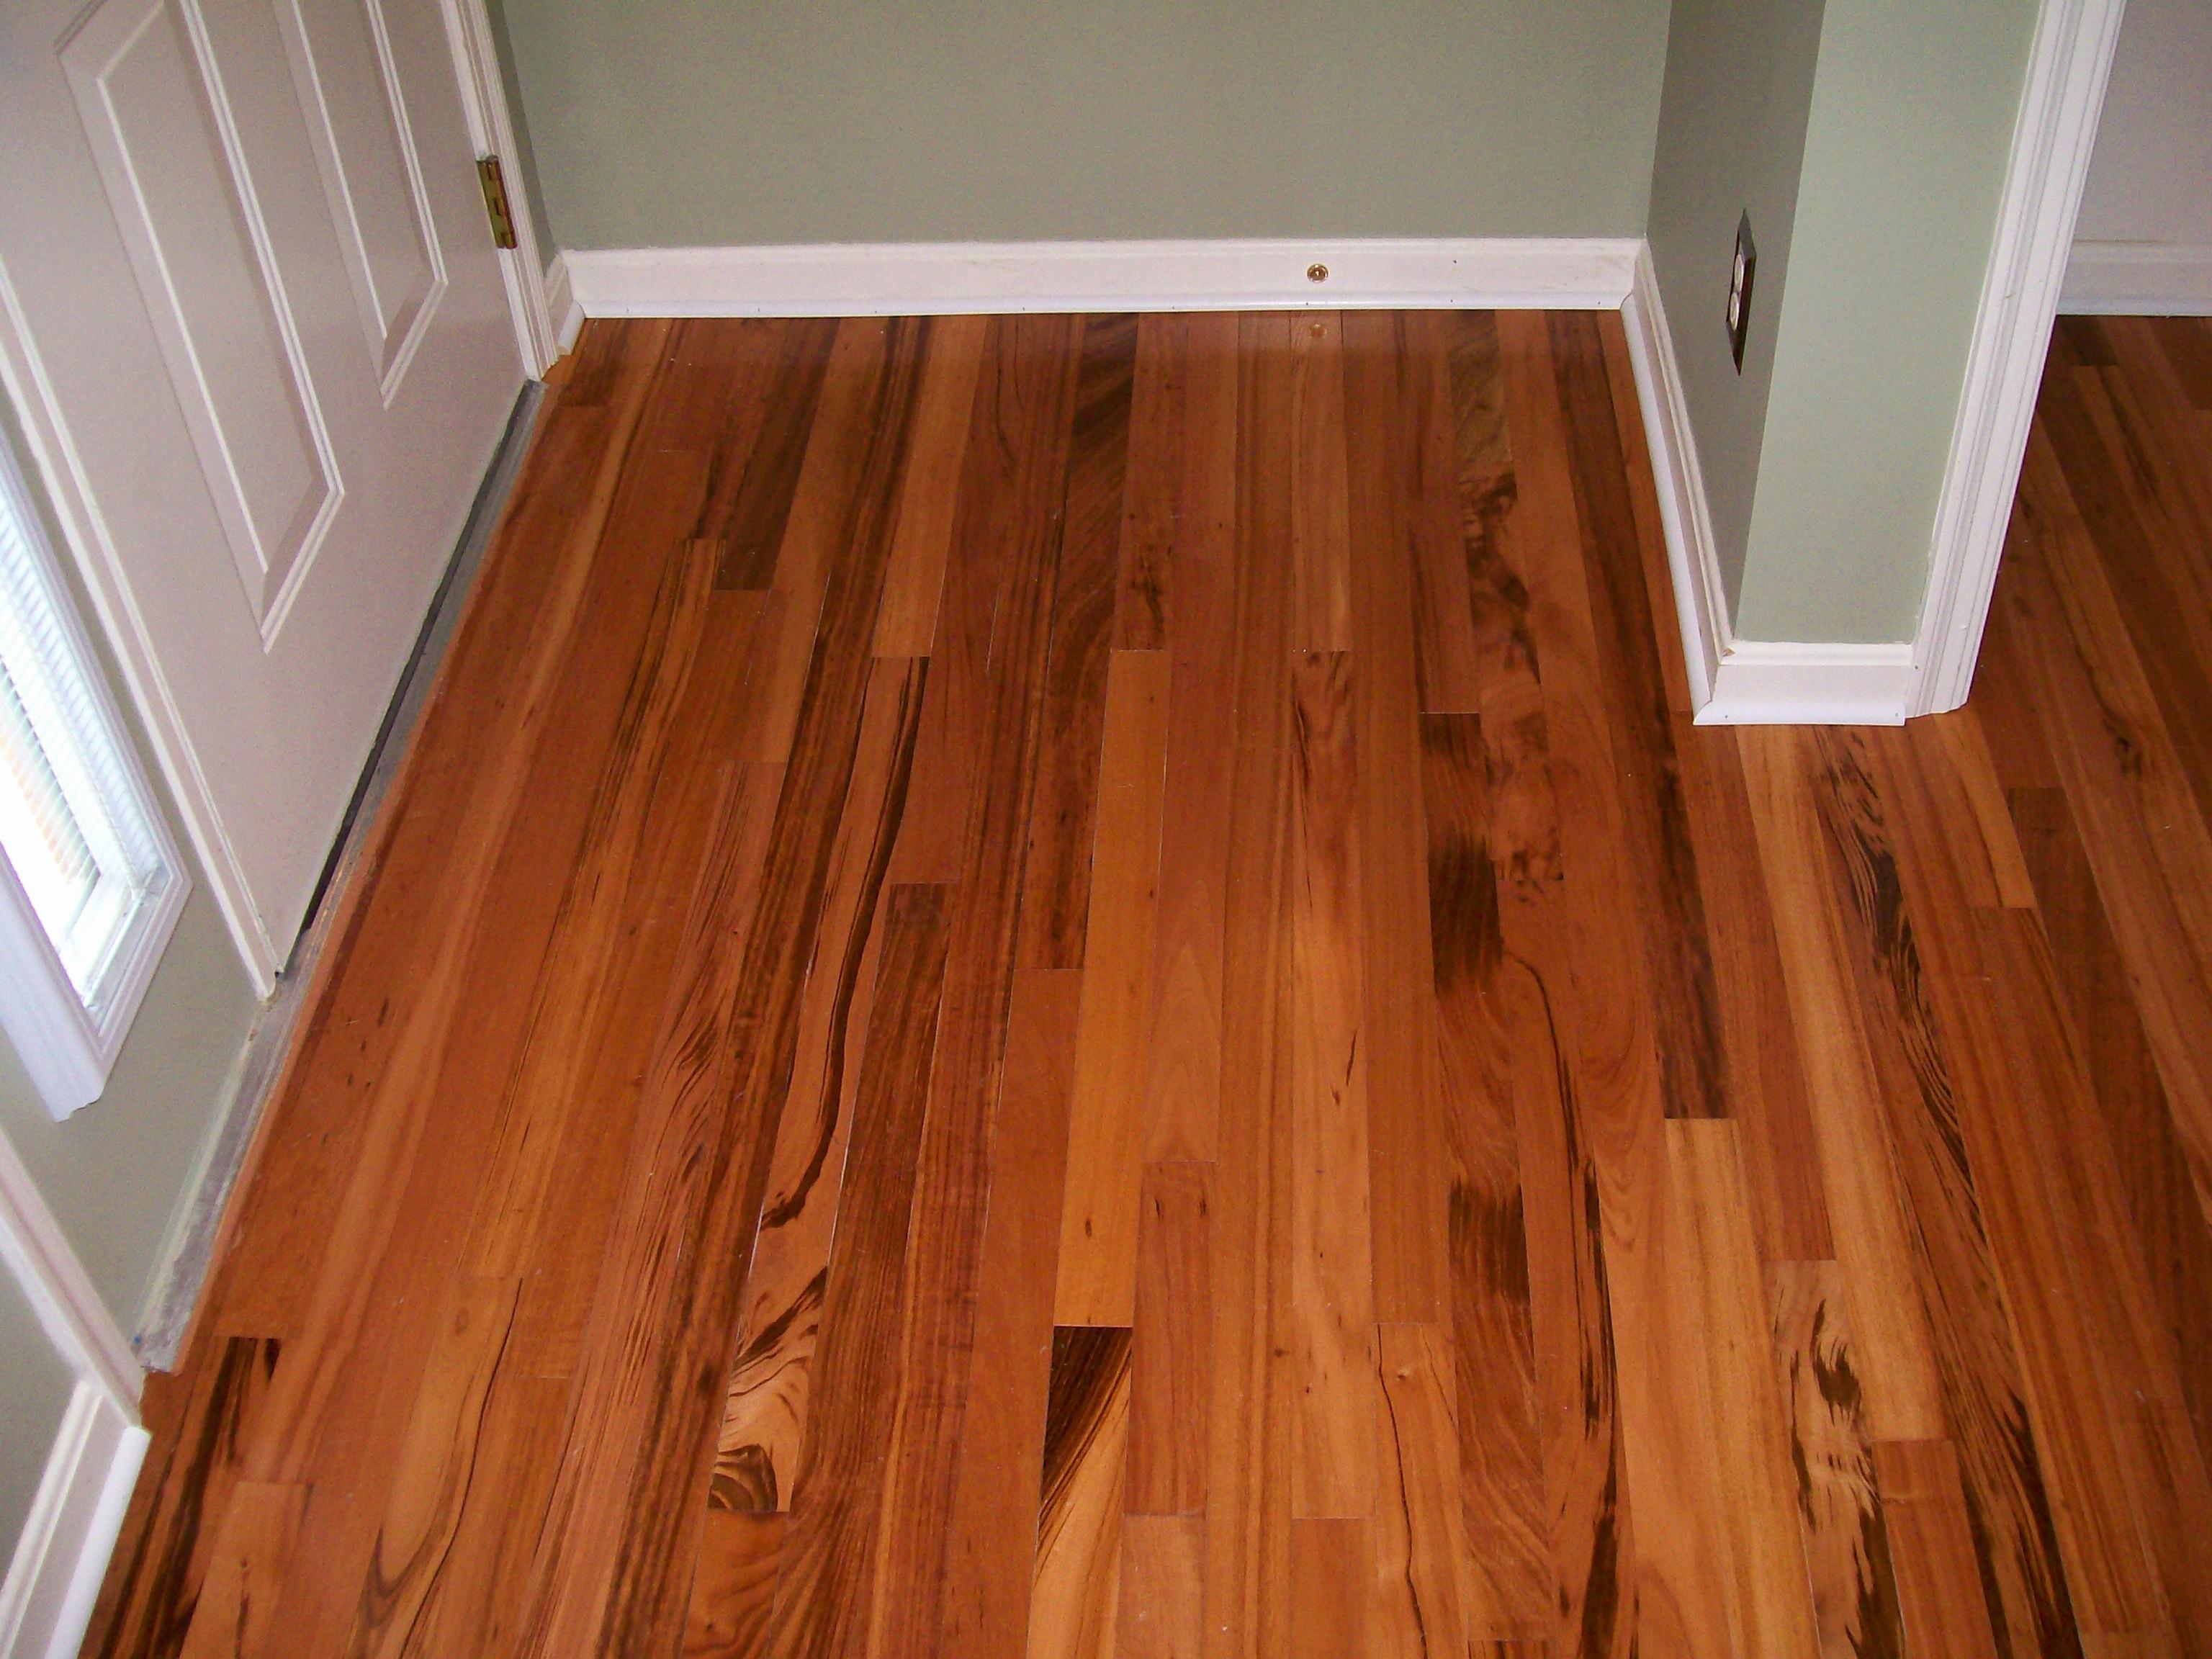 25 Best How To Install Engineered Hardwood Flooring On